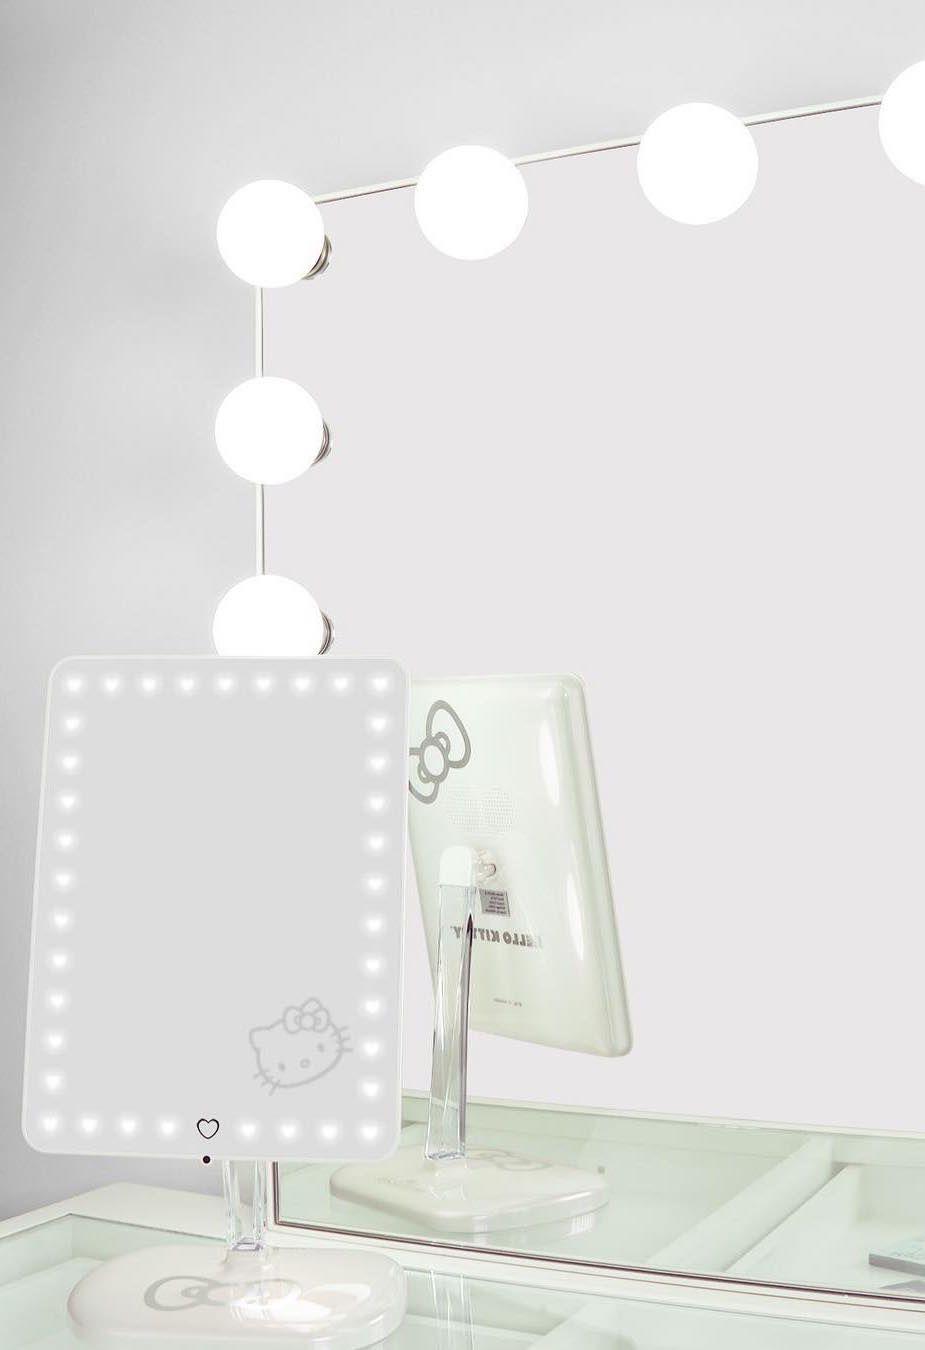 Penteadeira camarim branca, clean e minimalista